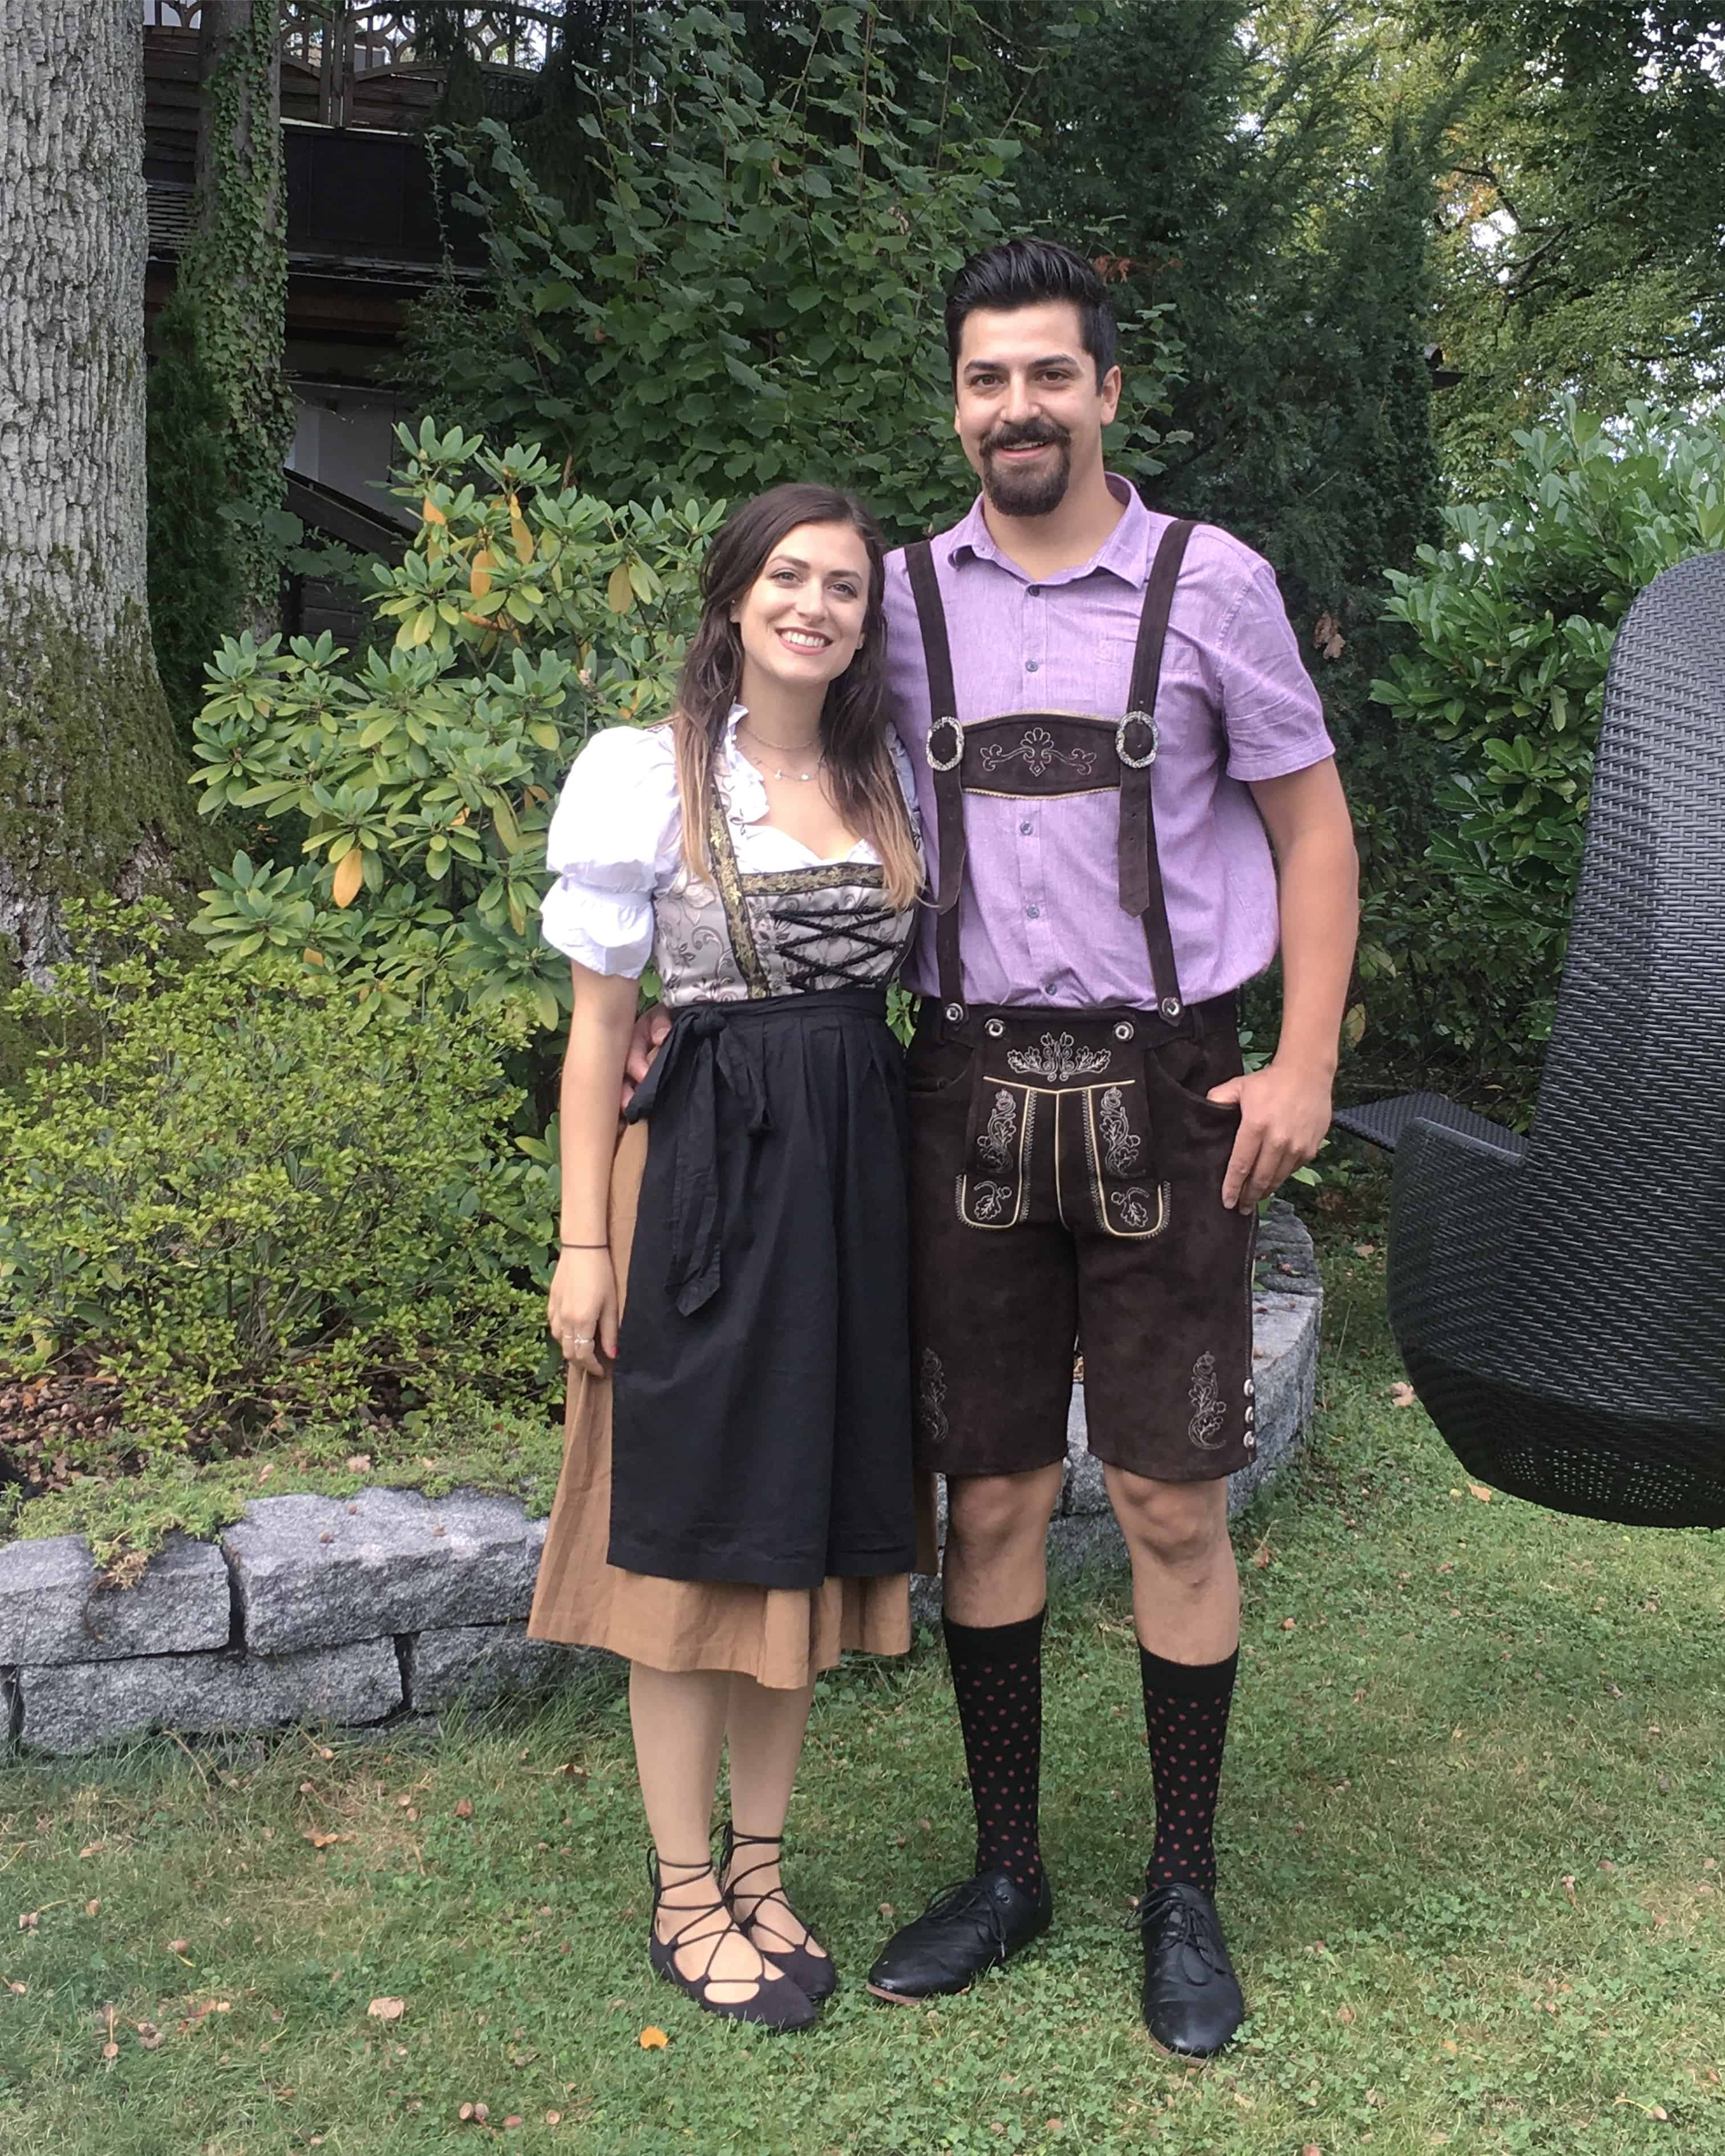 Oktoberfest outfits - Lederhosen and Dirndl - in Starnberg, Germany